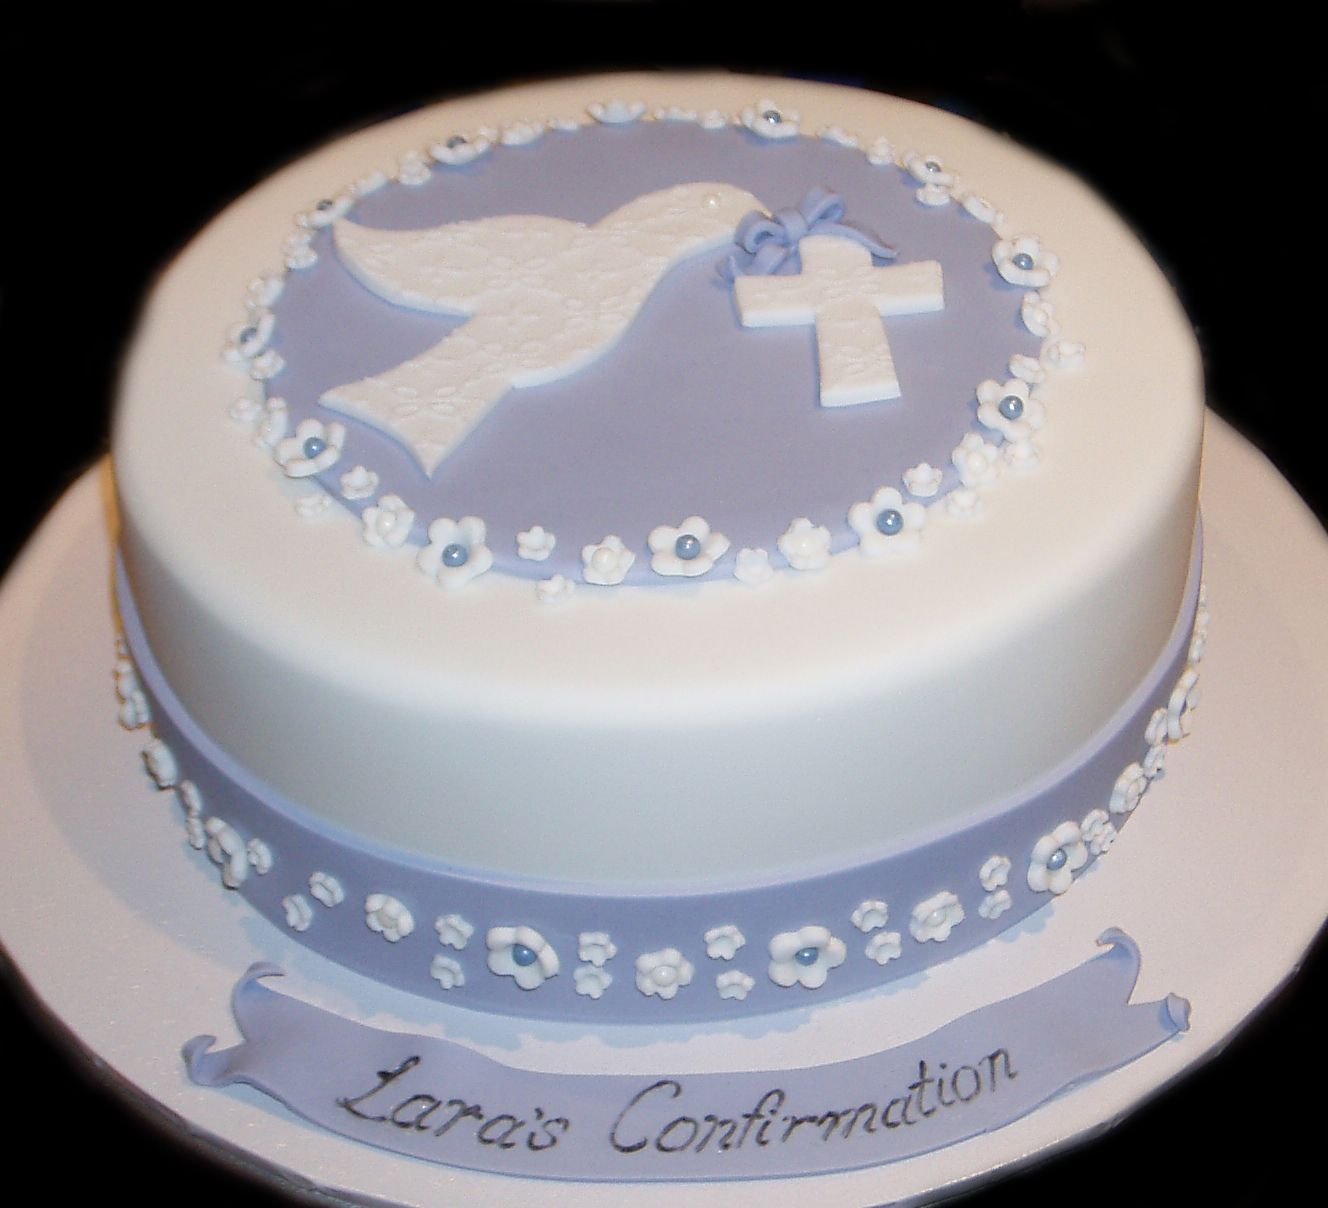 Cake Decorating Canberra